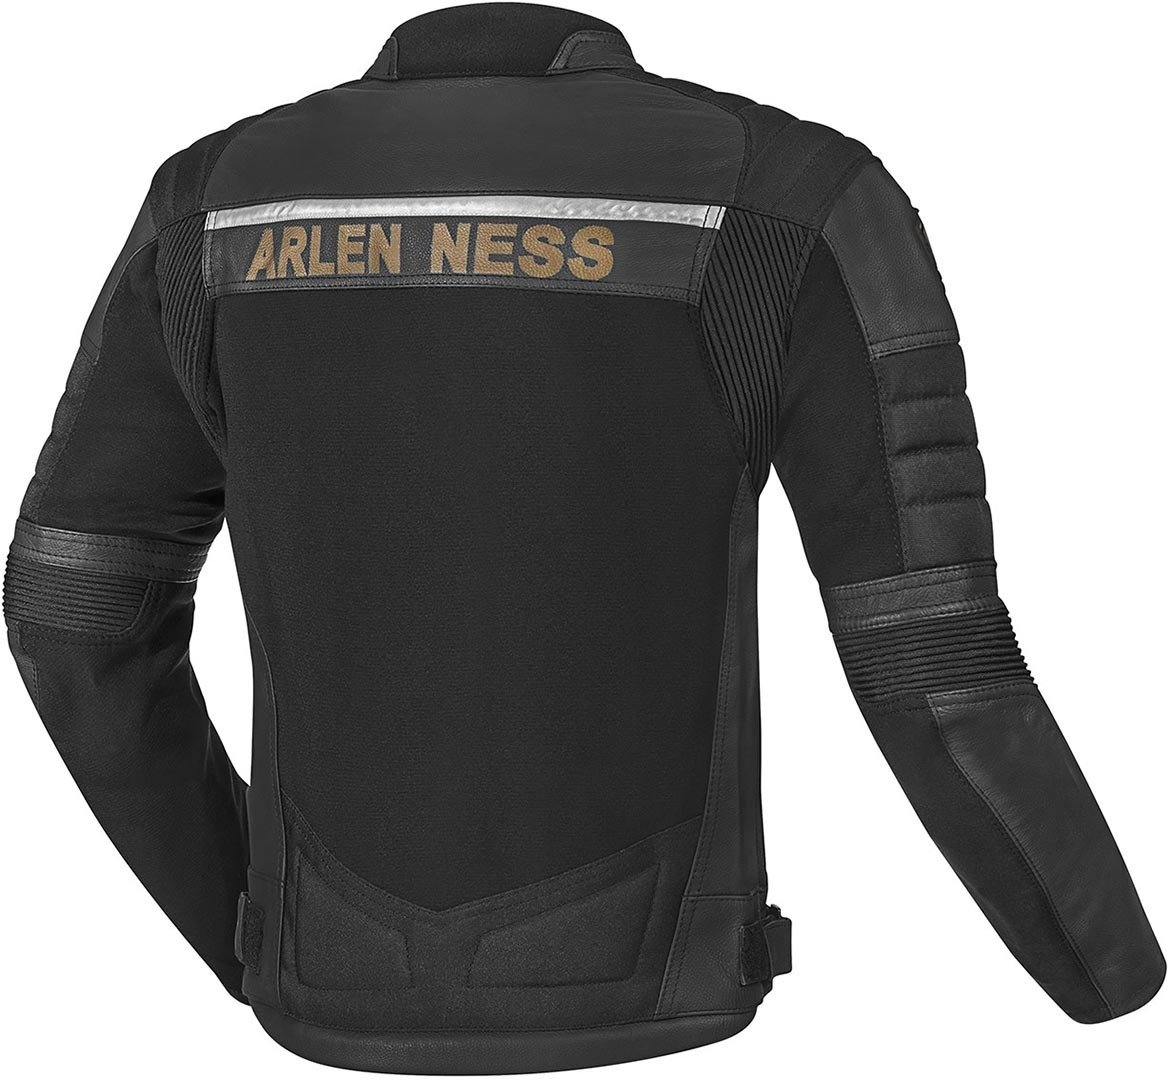 Arlen Ness Tough Rider Giacca Moto in Pelle//Tessuto